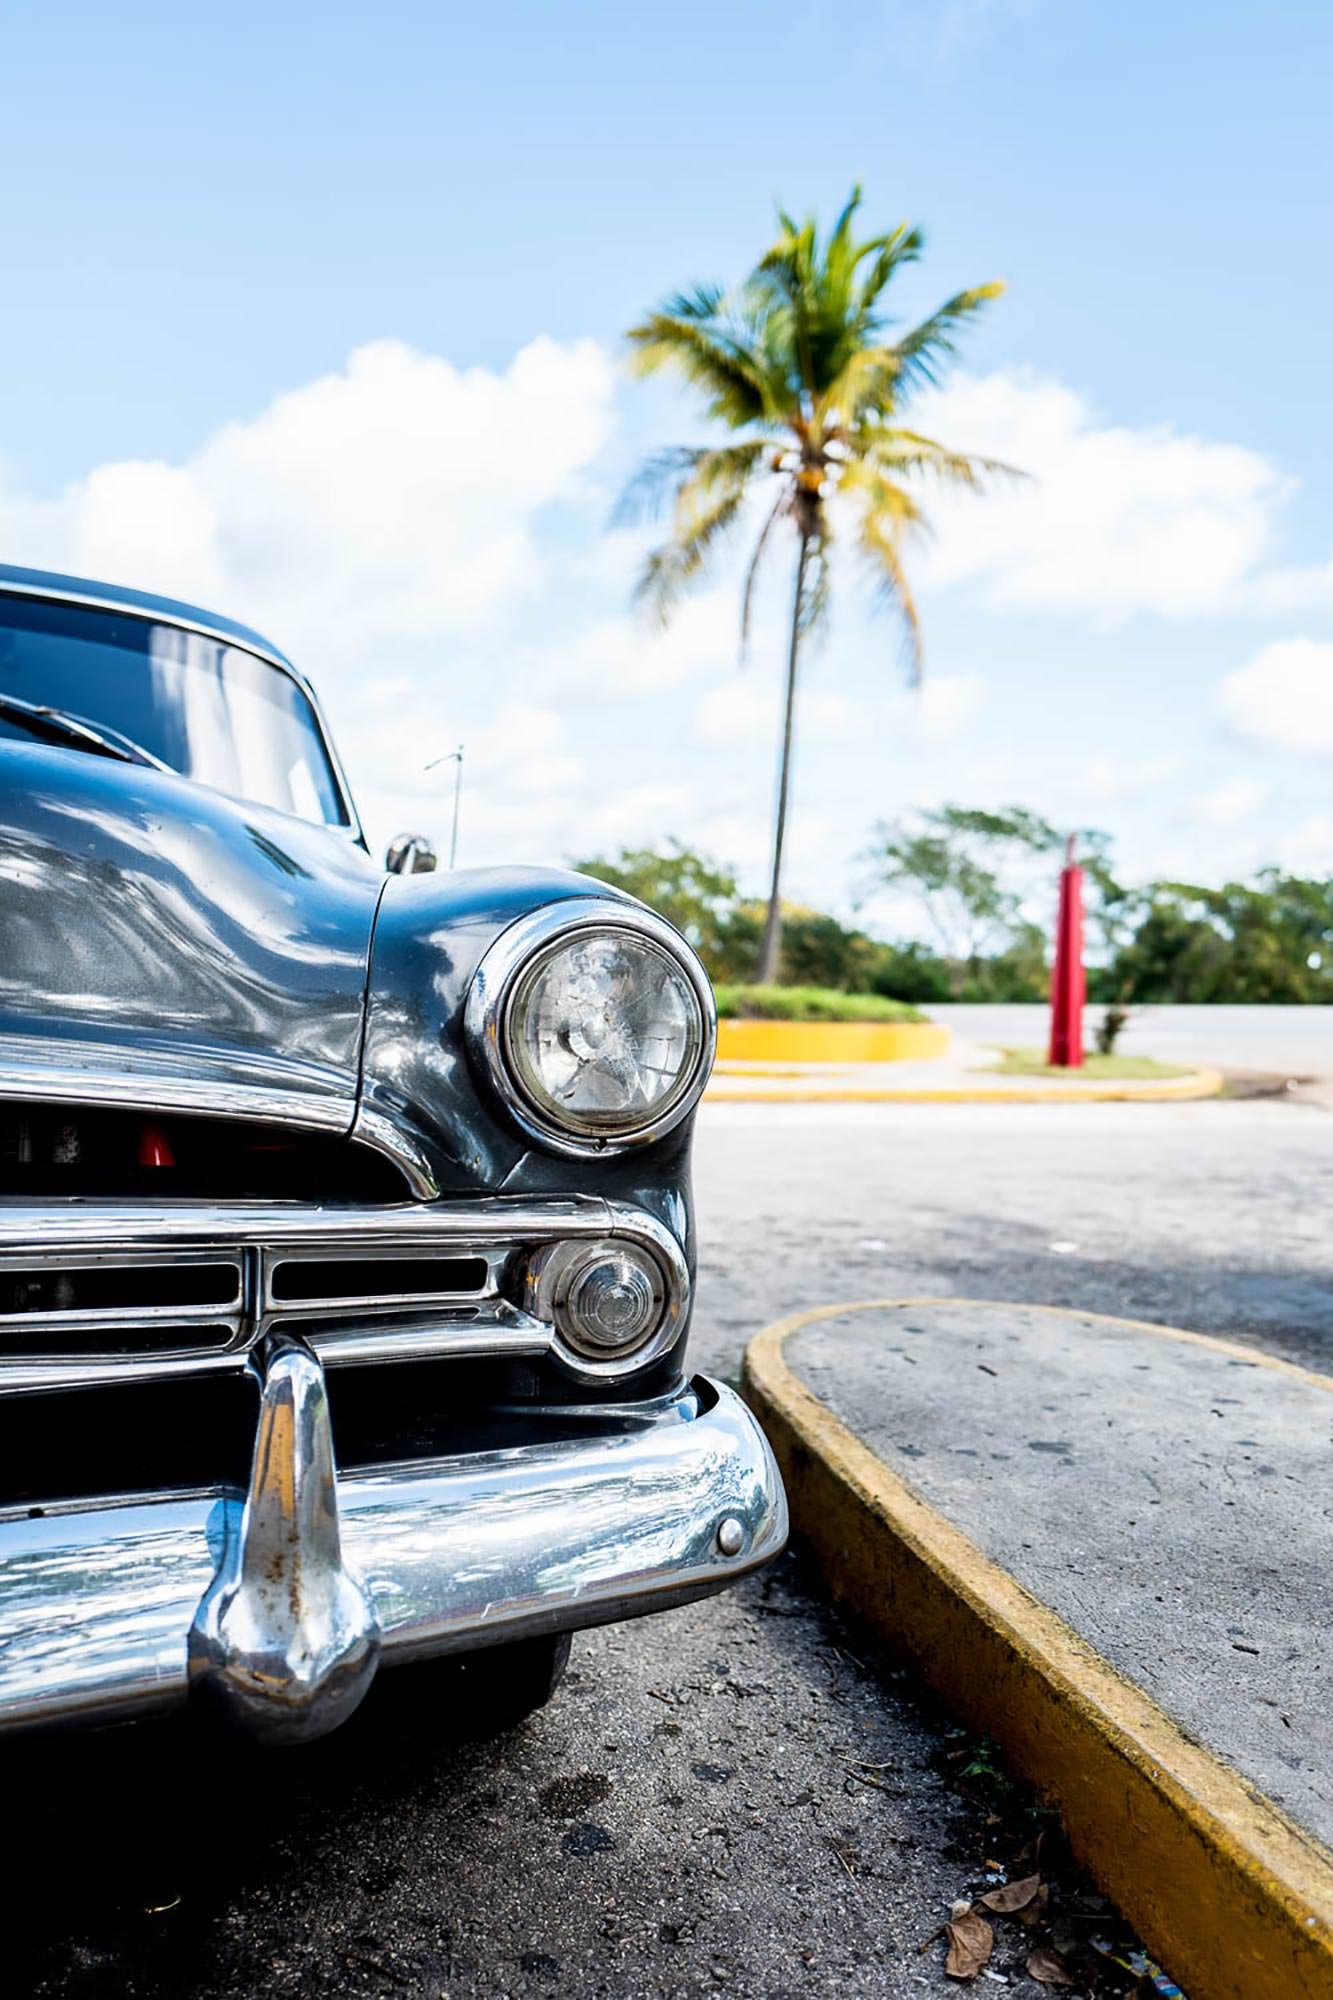 Cuba-Fotoshooting-thome-04